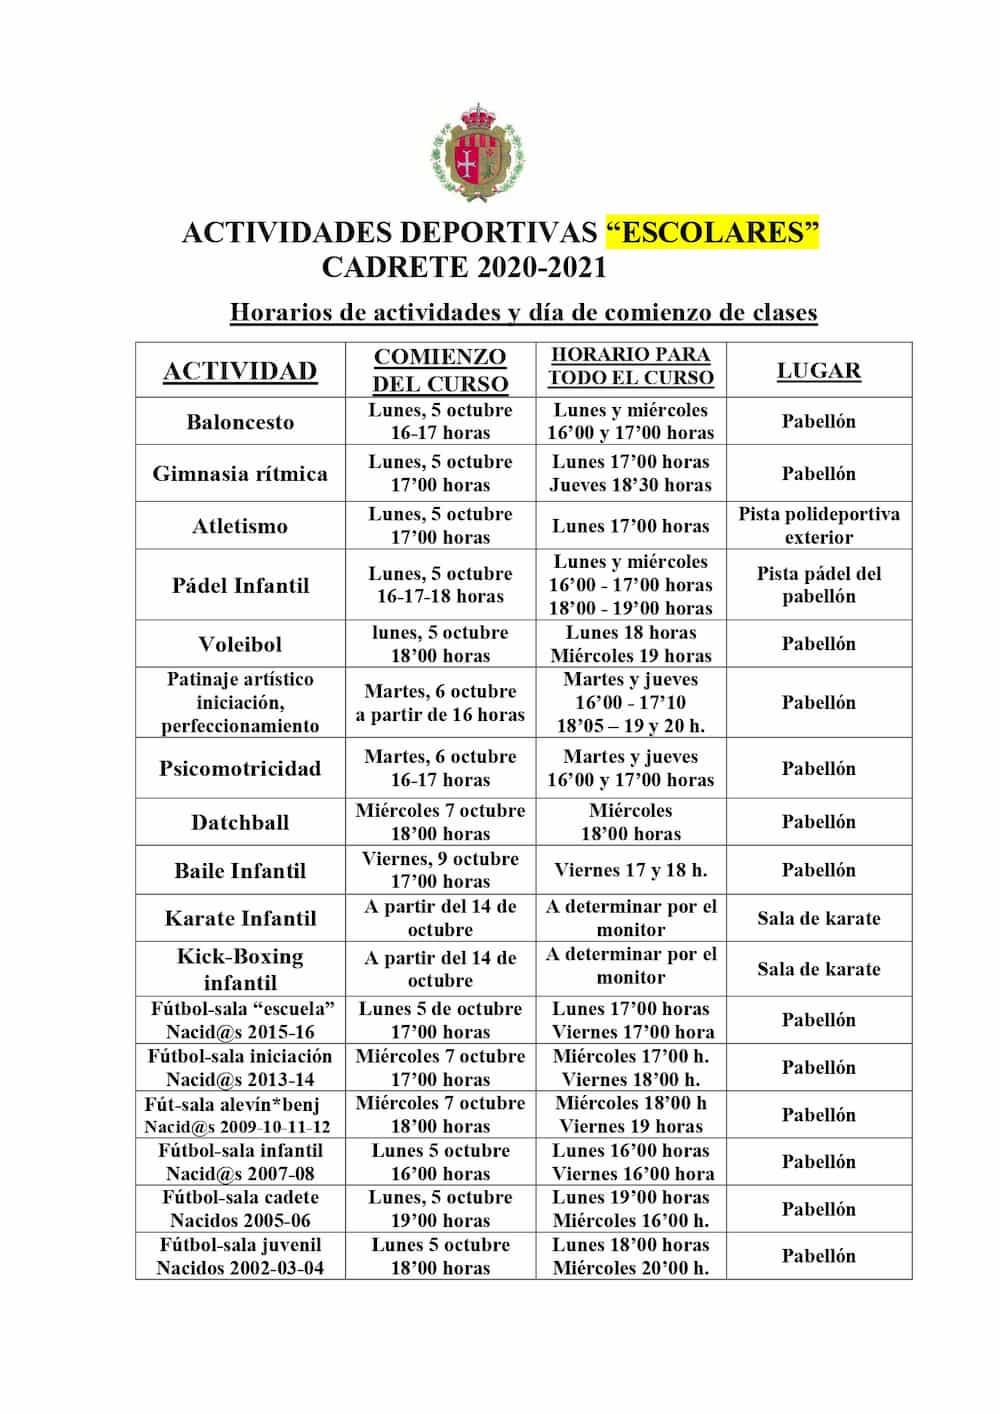 HORARIOS- T ACTIV CADRETE 20-21 Escolar_page-0001 (1)